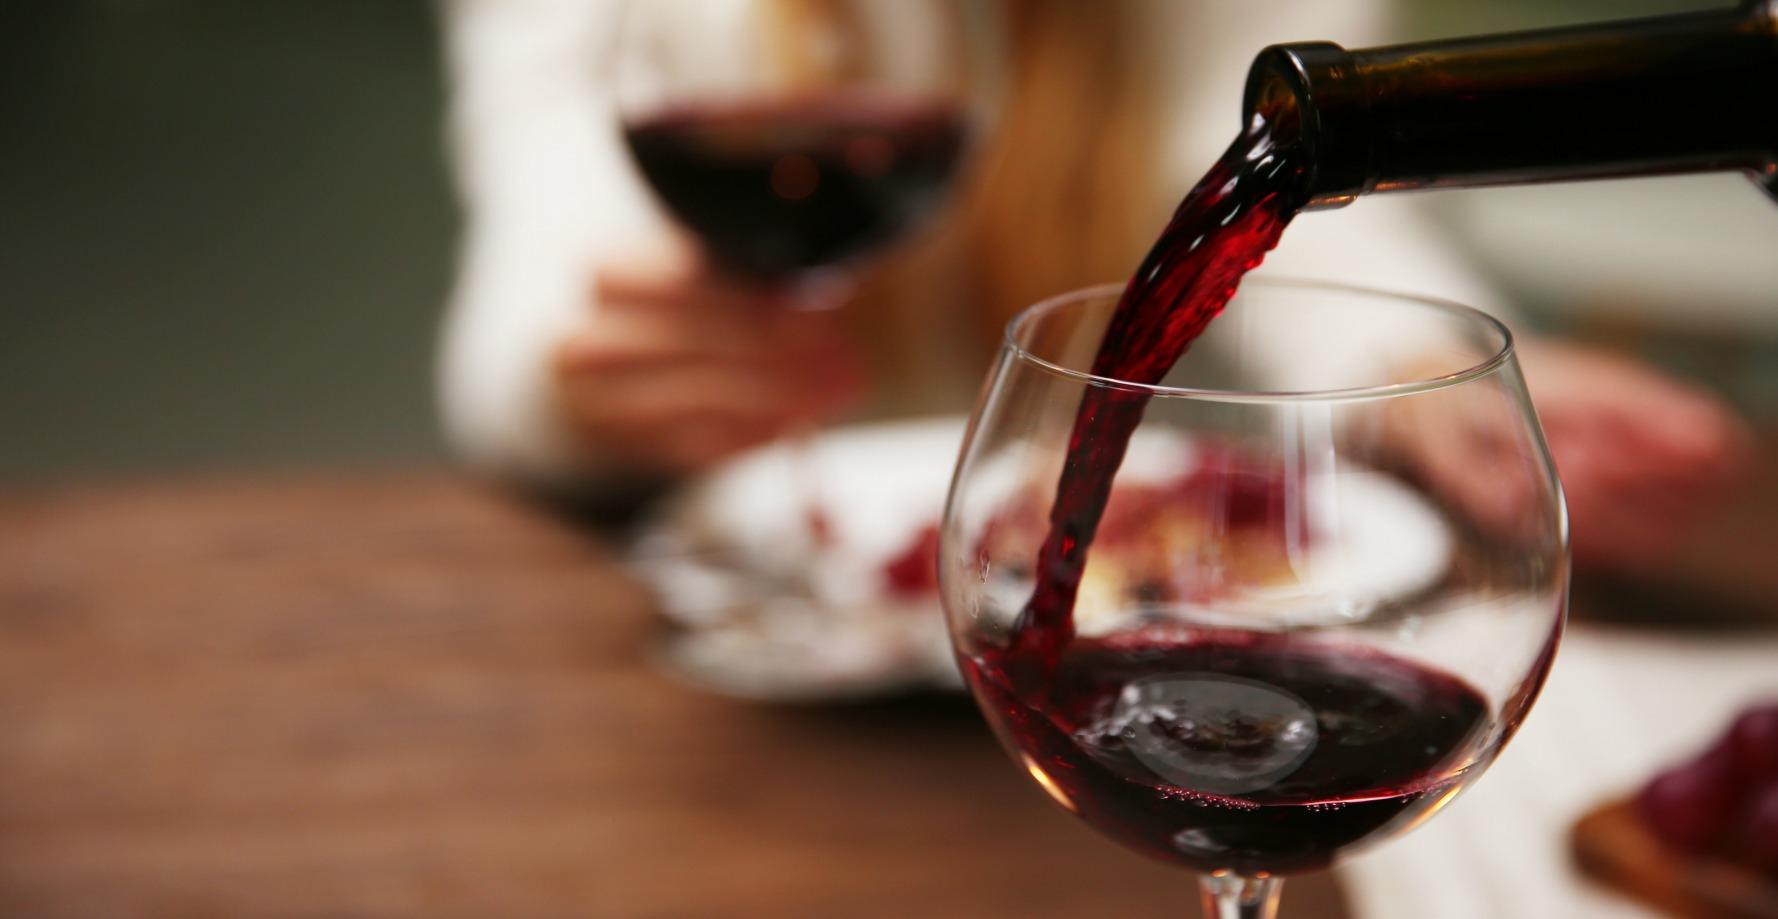 Maynard James Keenan of Tool owns a winery- and it's vegan